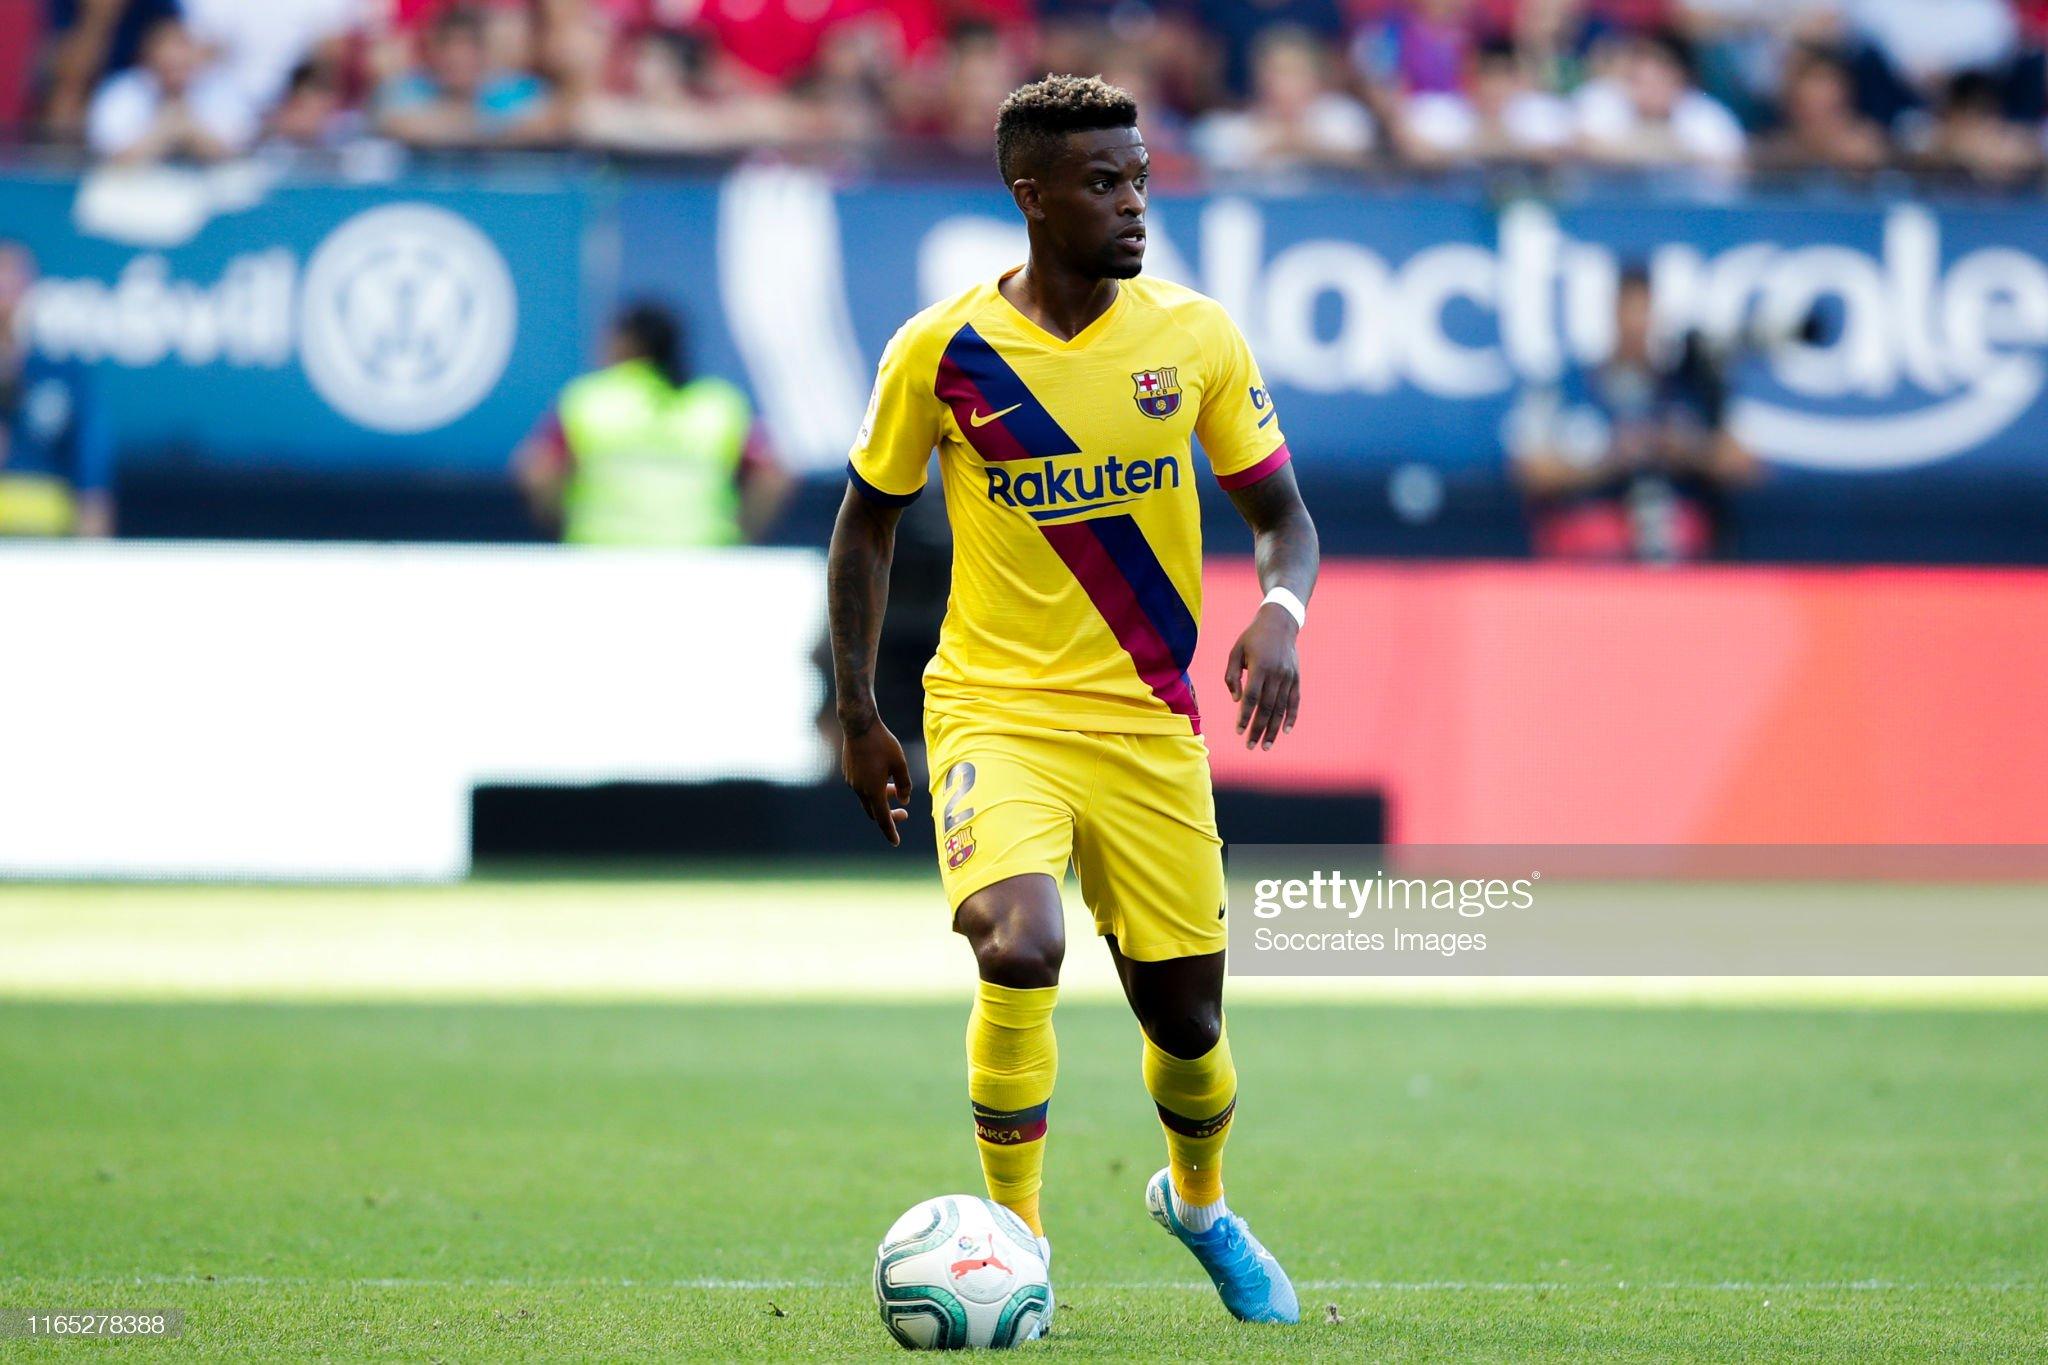 صور مباراة : أوساسونا - برشلونة 2-2 ( 31-08-2019 )  Nelson-semedo-of-fc-barcelona-during-the-la-liga-santander-match-v-picture-id1165278388?s=2048x2048